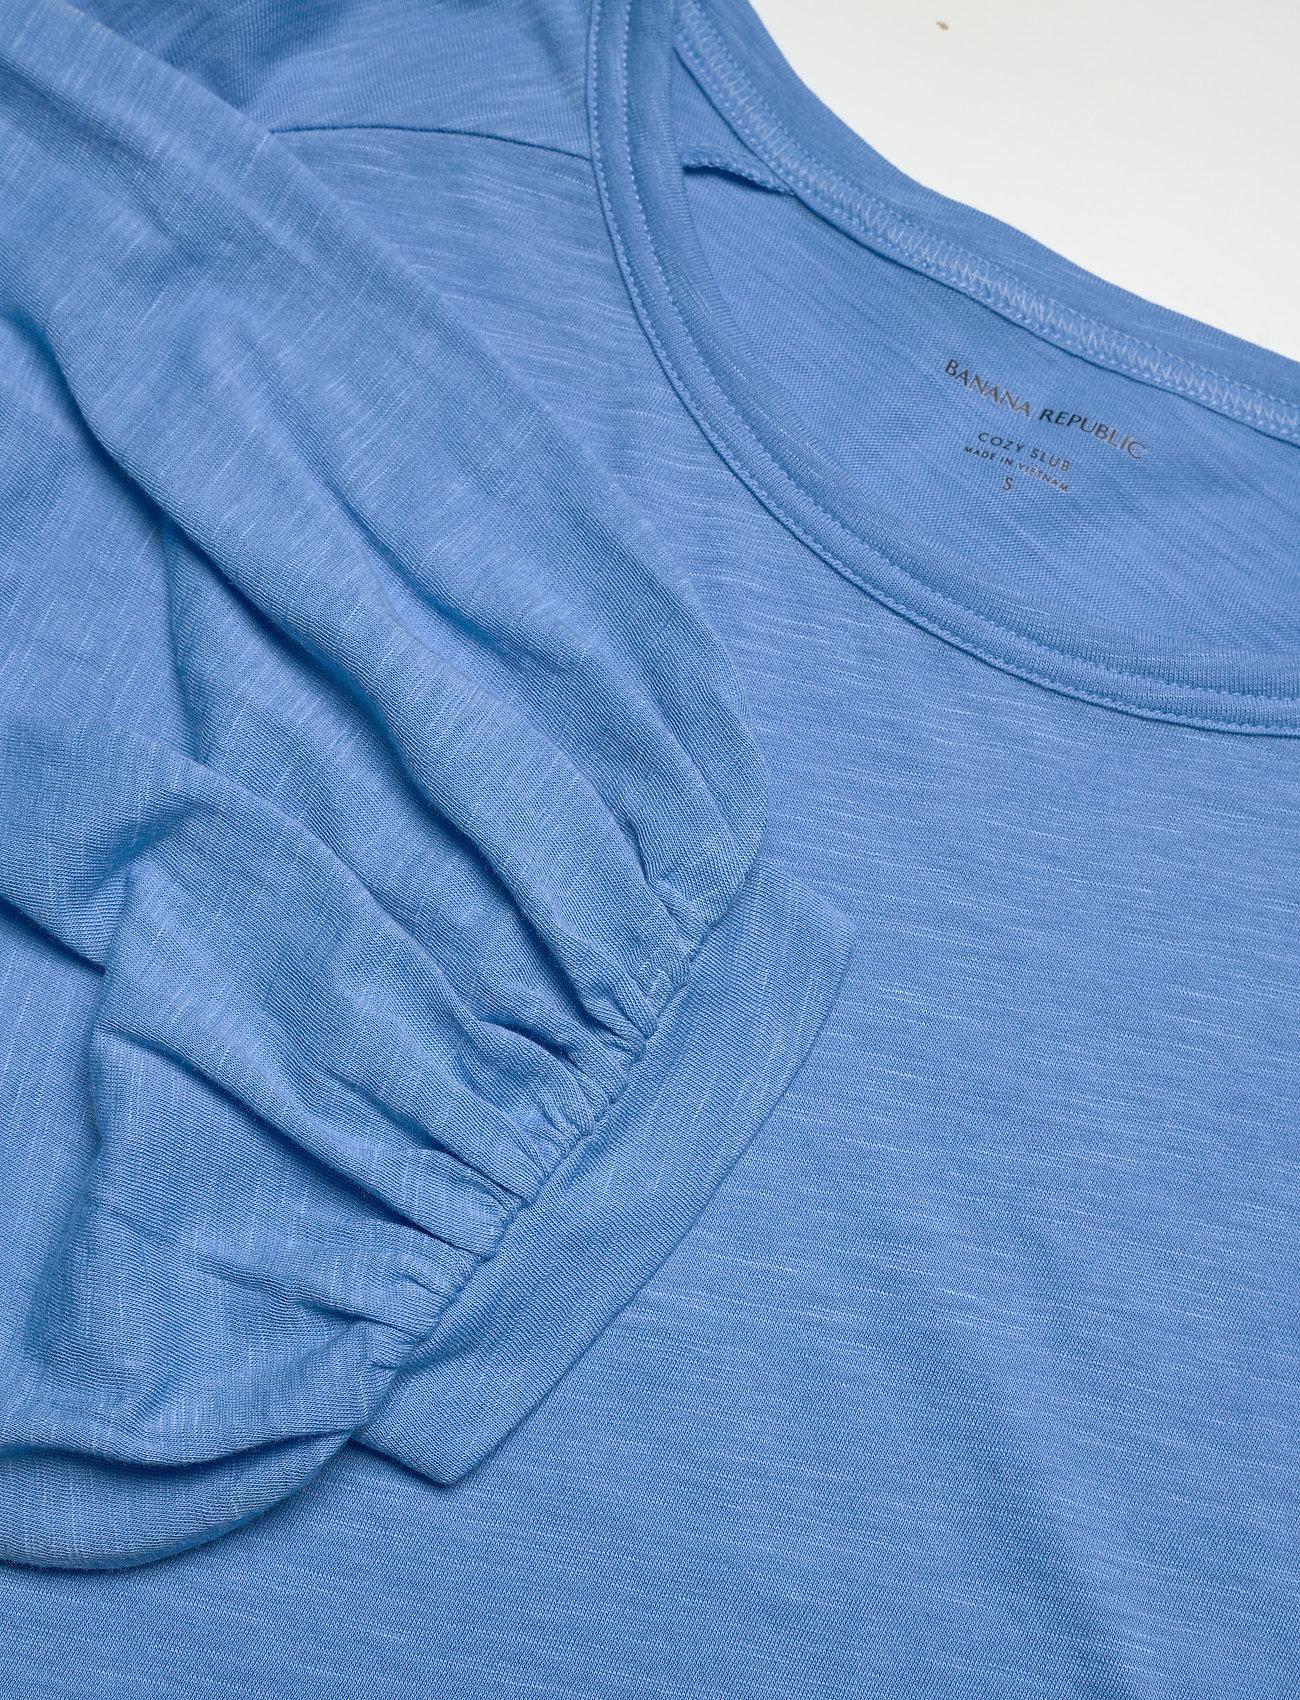 Balloon-sleeve Cropped Top   - Banana Republic -  Women's T-shirts & Tops Purchase